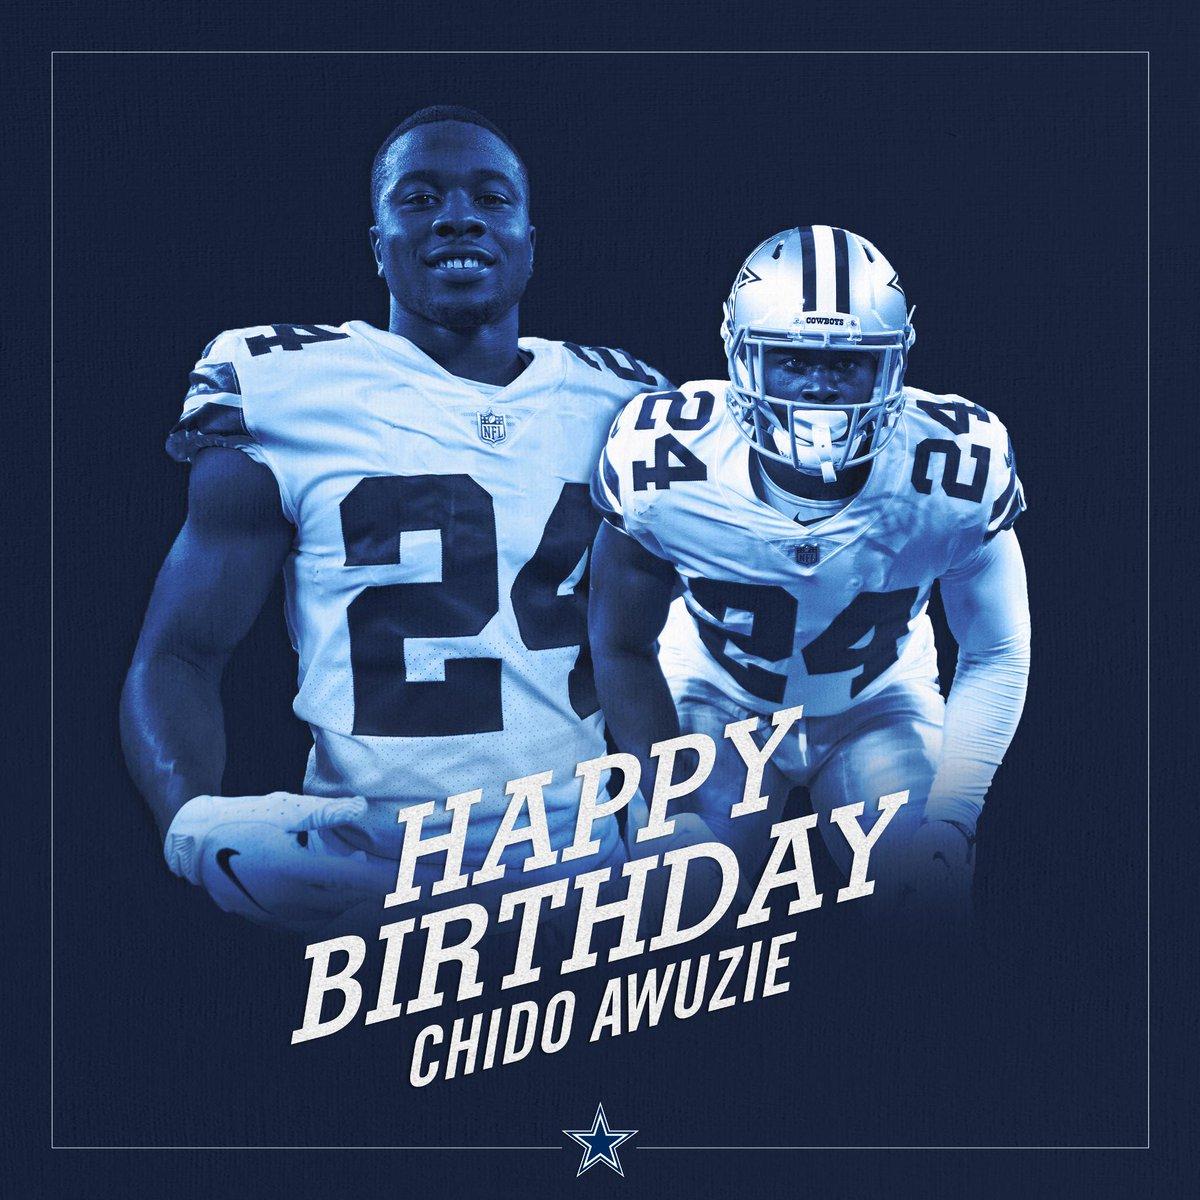 #CowboysNation, join us in wishing @ChidobeAwuzie a happy birthday!